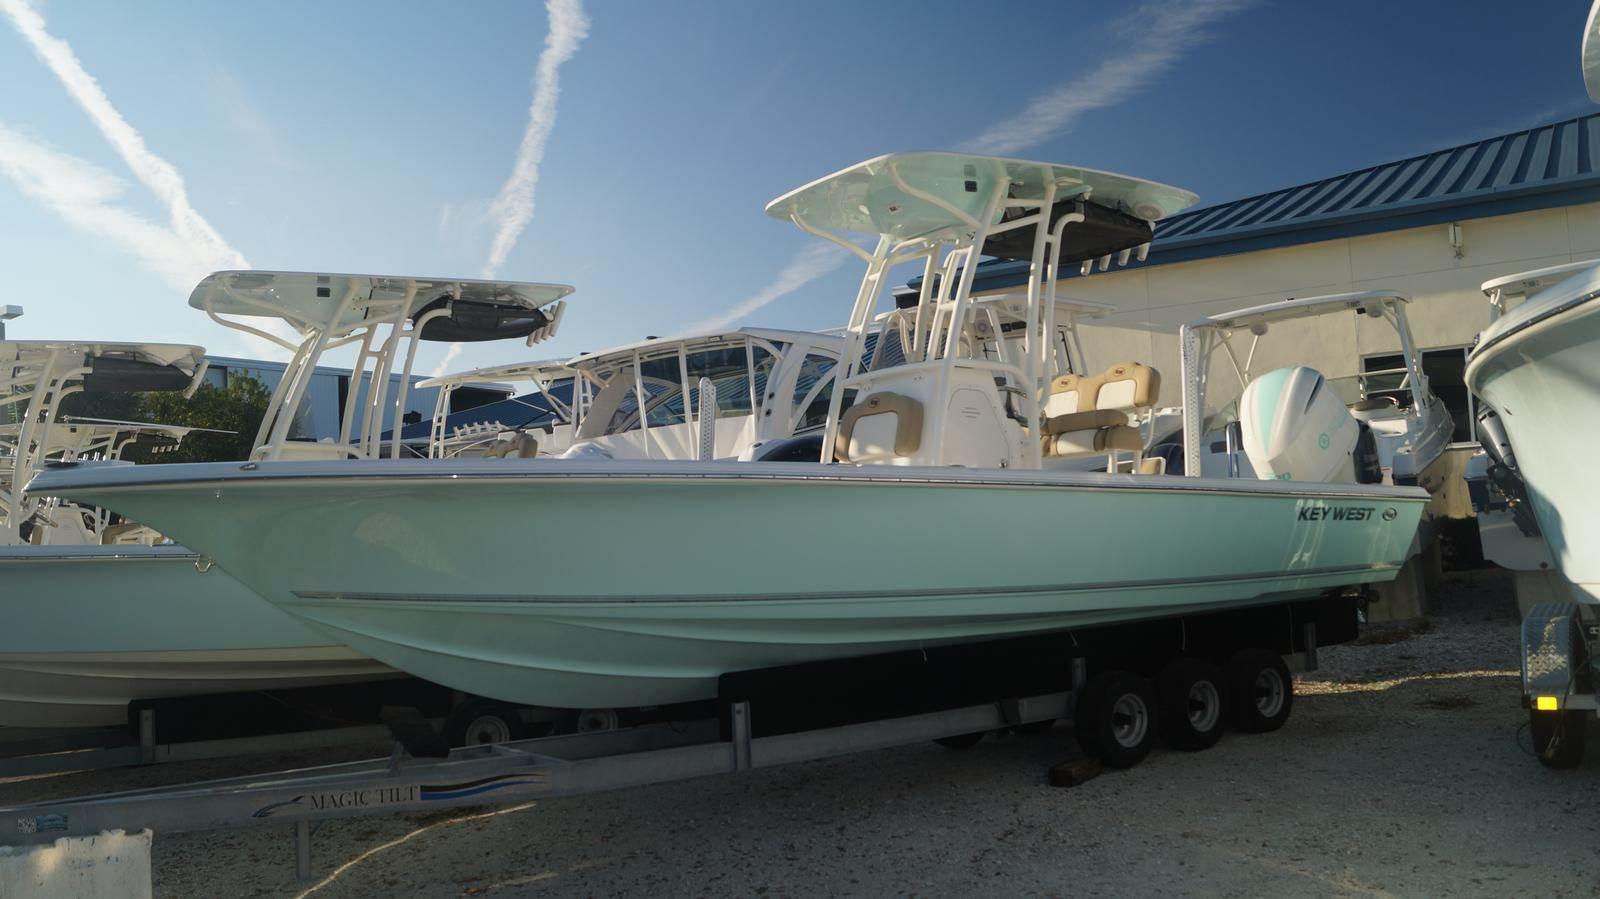 NEW 2019 Key West Boats, Inc. 250 Bay Reef - Sara Bay Marina